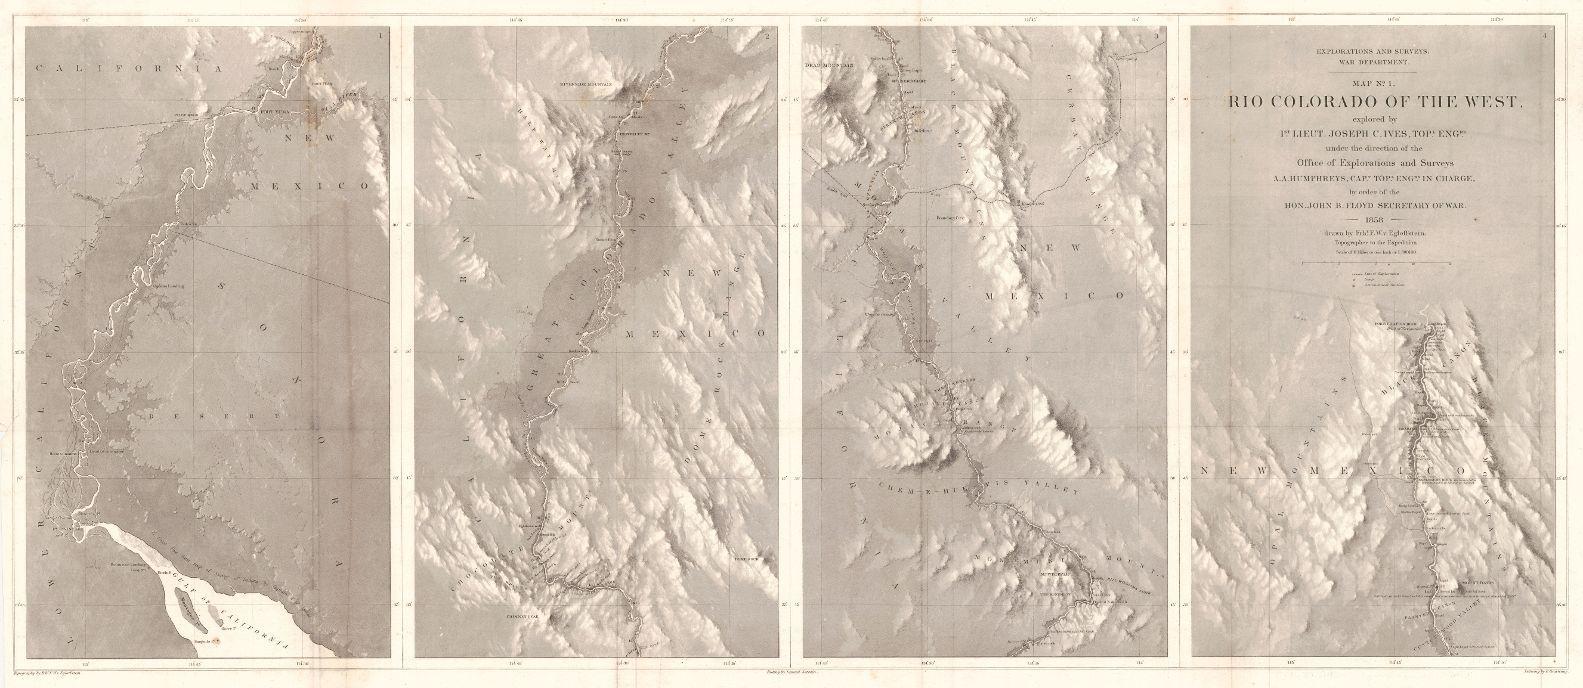 Map Of Arizona 1858.Explorations And Surveys War Department Map No 1 Rio Colorado Of